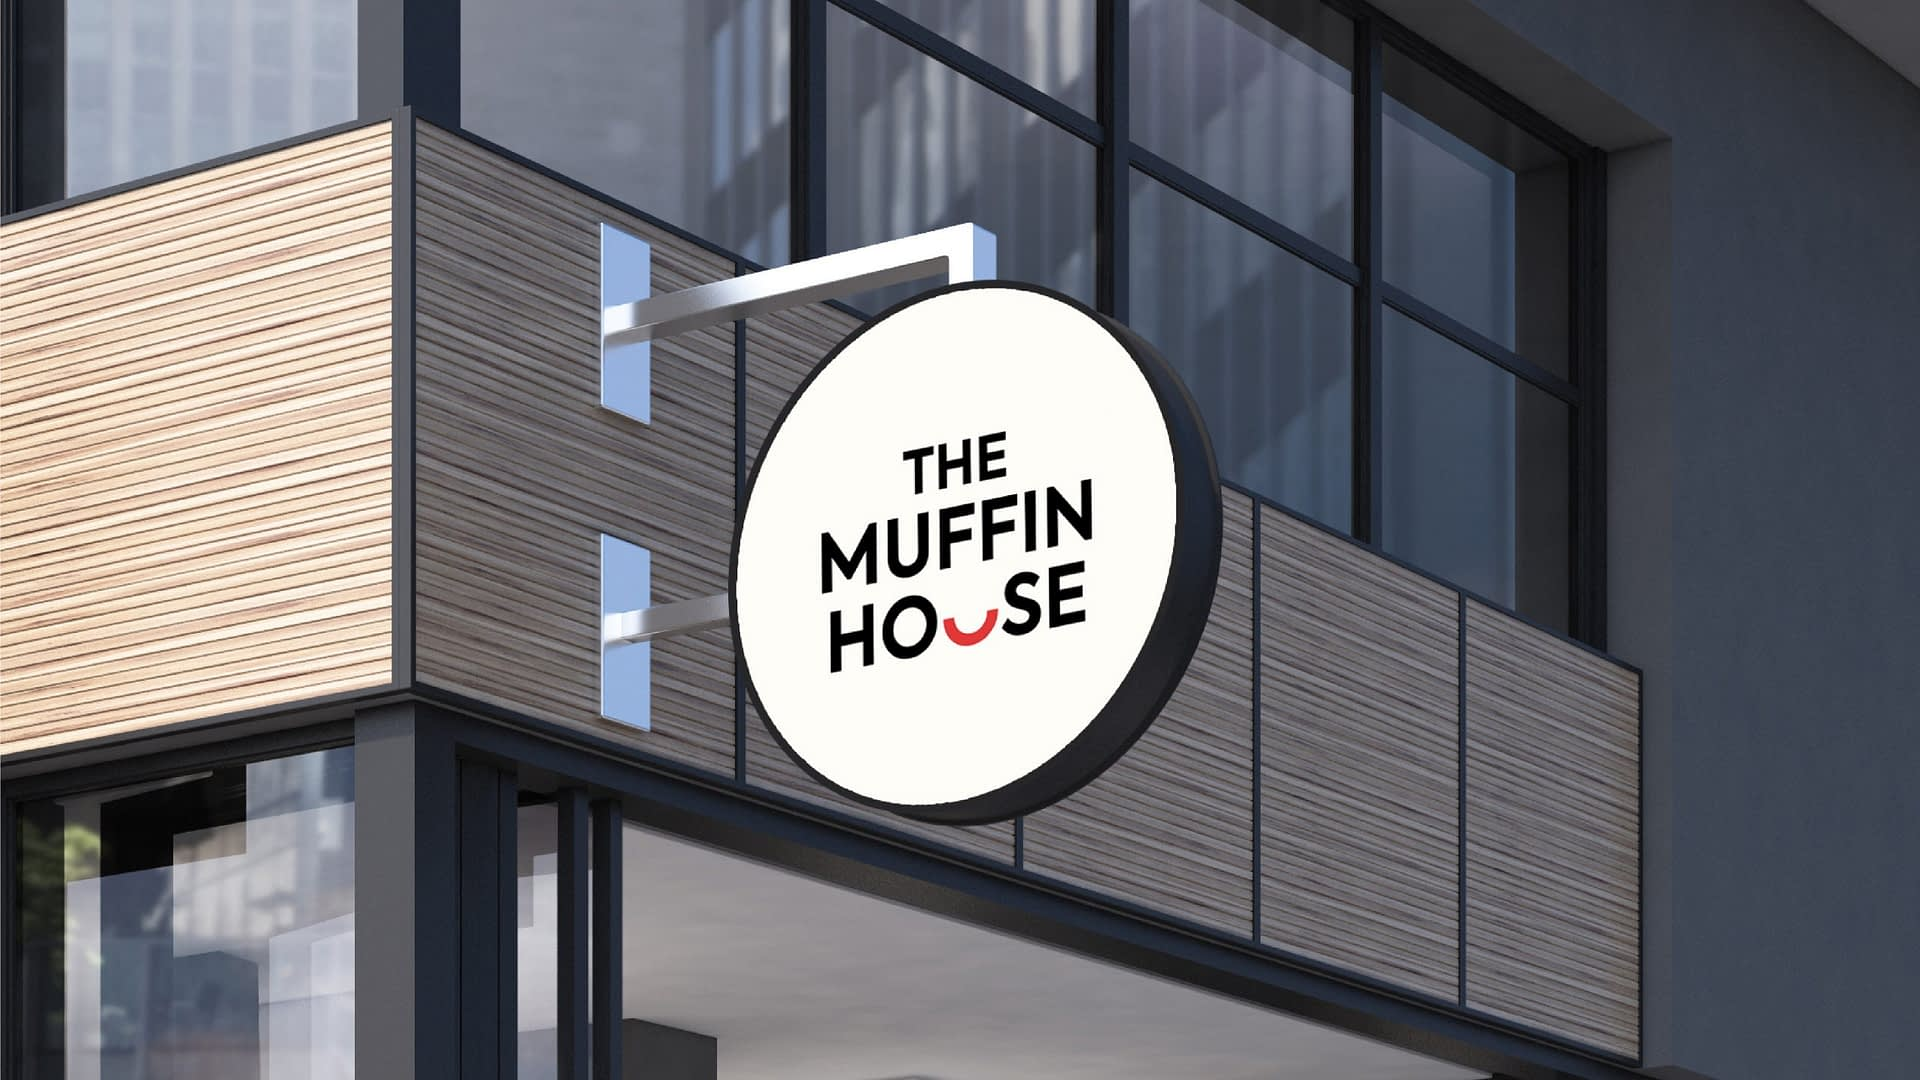 THE MUFFIN HOUSE LOGO SIGNATURE DESIGN